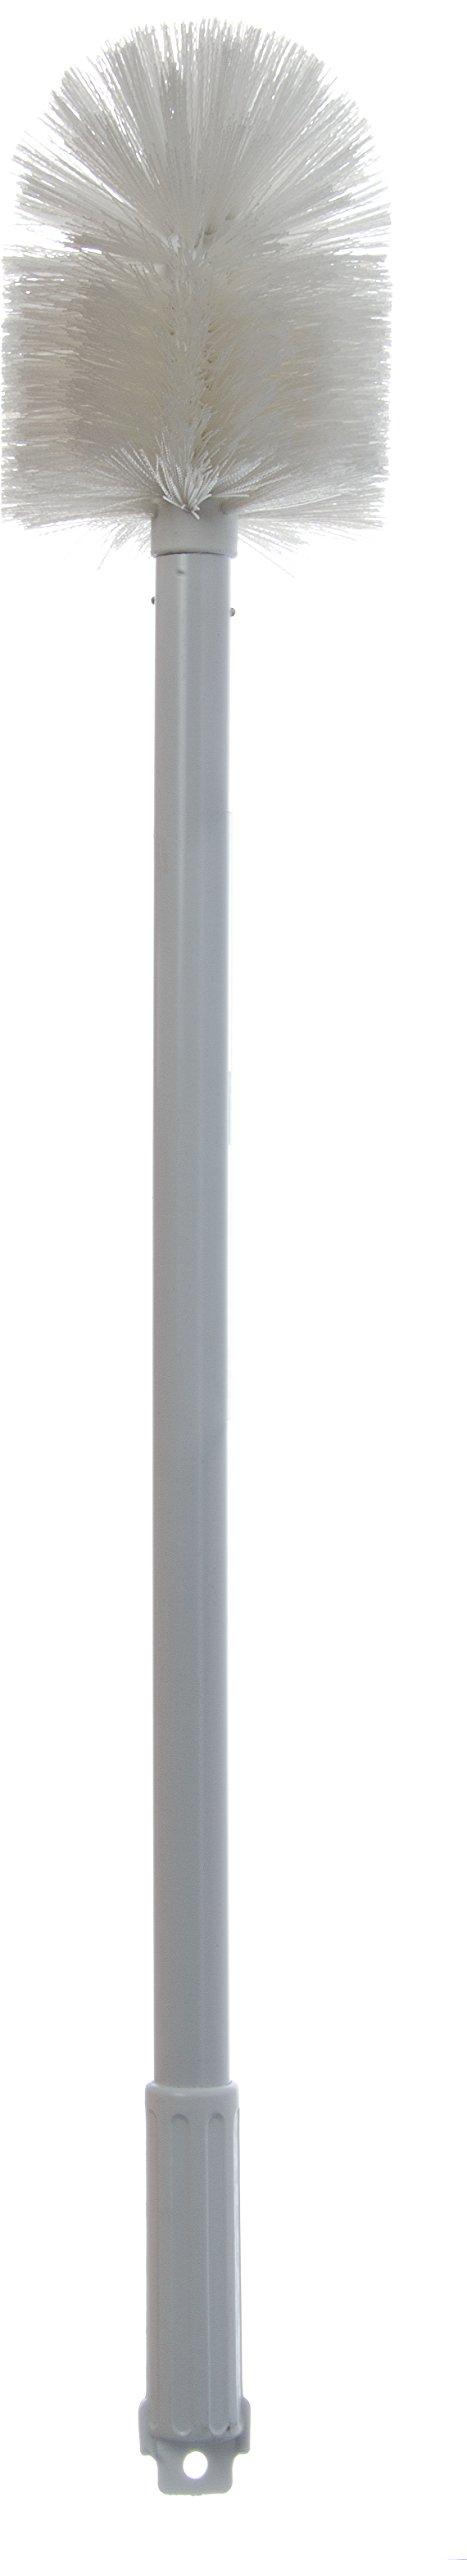 Carlisle 4000802 Sparta Spectrum Multi-Purpose Round Valve and Fitting Brush, Plastic Handle, White Polyester Bristles, 6'' L x 5'' Dia. Brush, 30'' Overall Length (Case of 6) by Carlisle (Image #4)